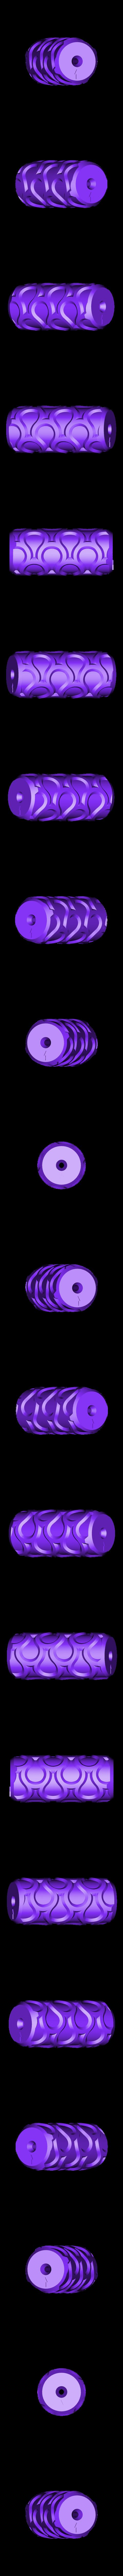 ScalesRoller.stl Download free STL file Fish Scales Paint Roller • 3D print design, G3tPainted